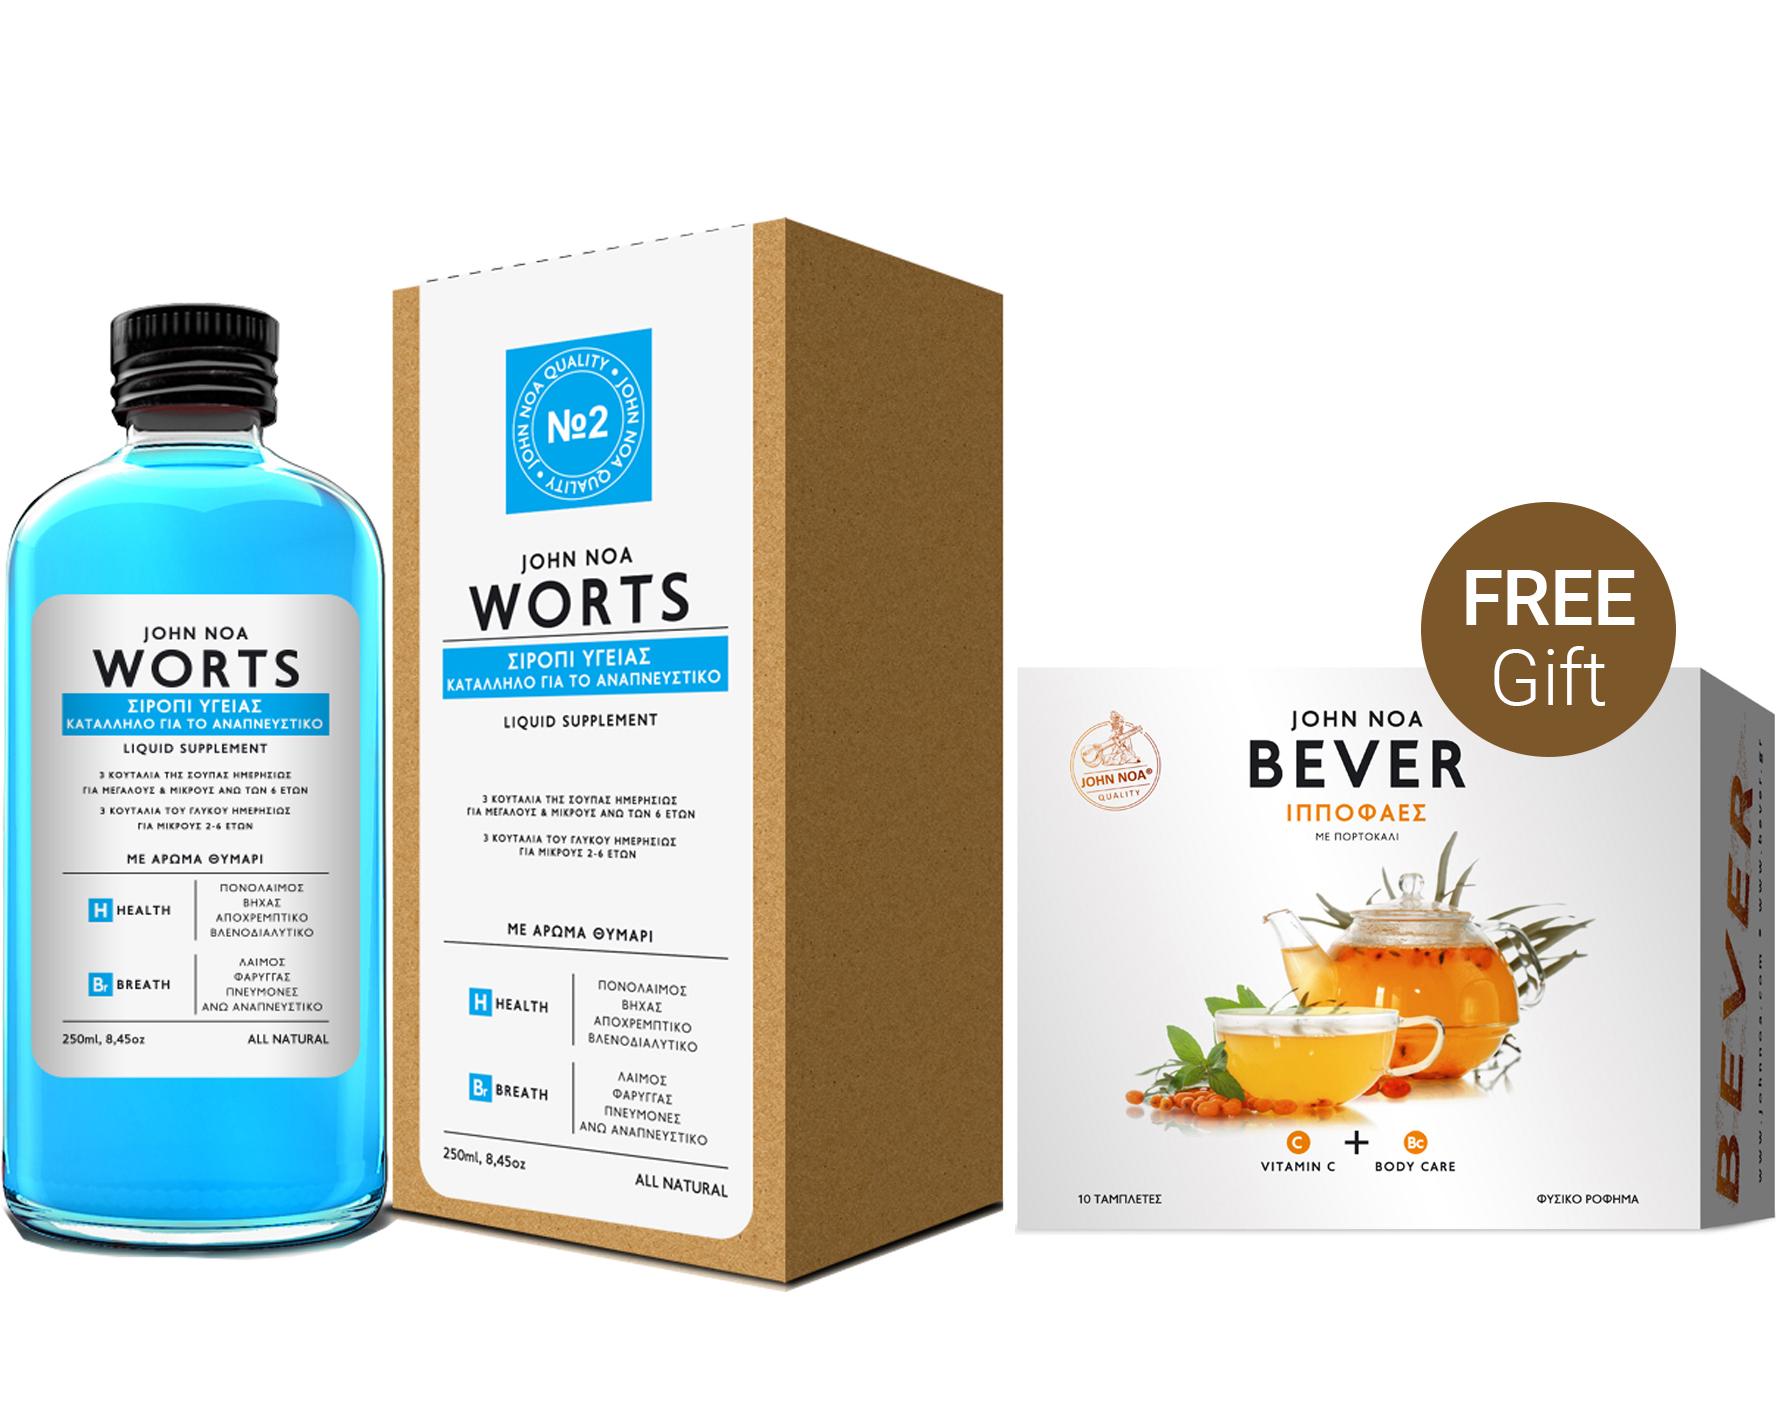 John Noa Worts Σιρόπι Υγείας Κατάλληλο για το Αναπνευστικό 250ml + Δώρο John Noa Bever Ιπποφαές Με Άρωμα Πορτοκάλι 10Αναβρ.Δισκ.